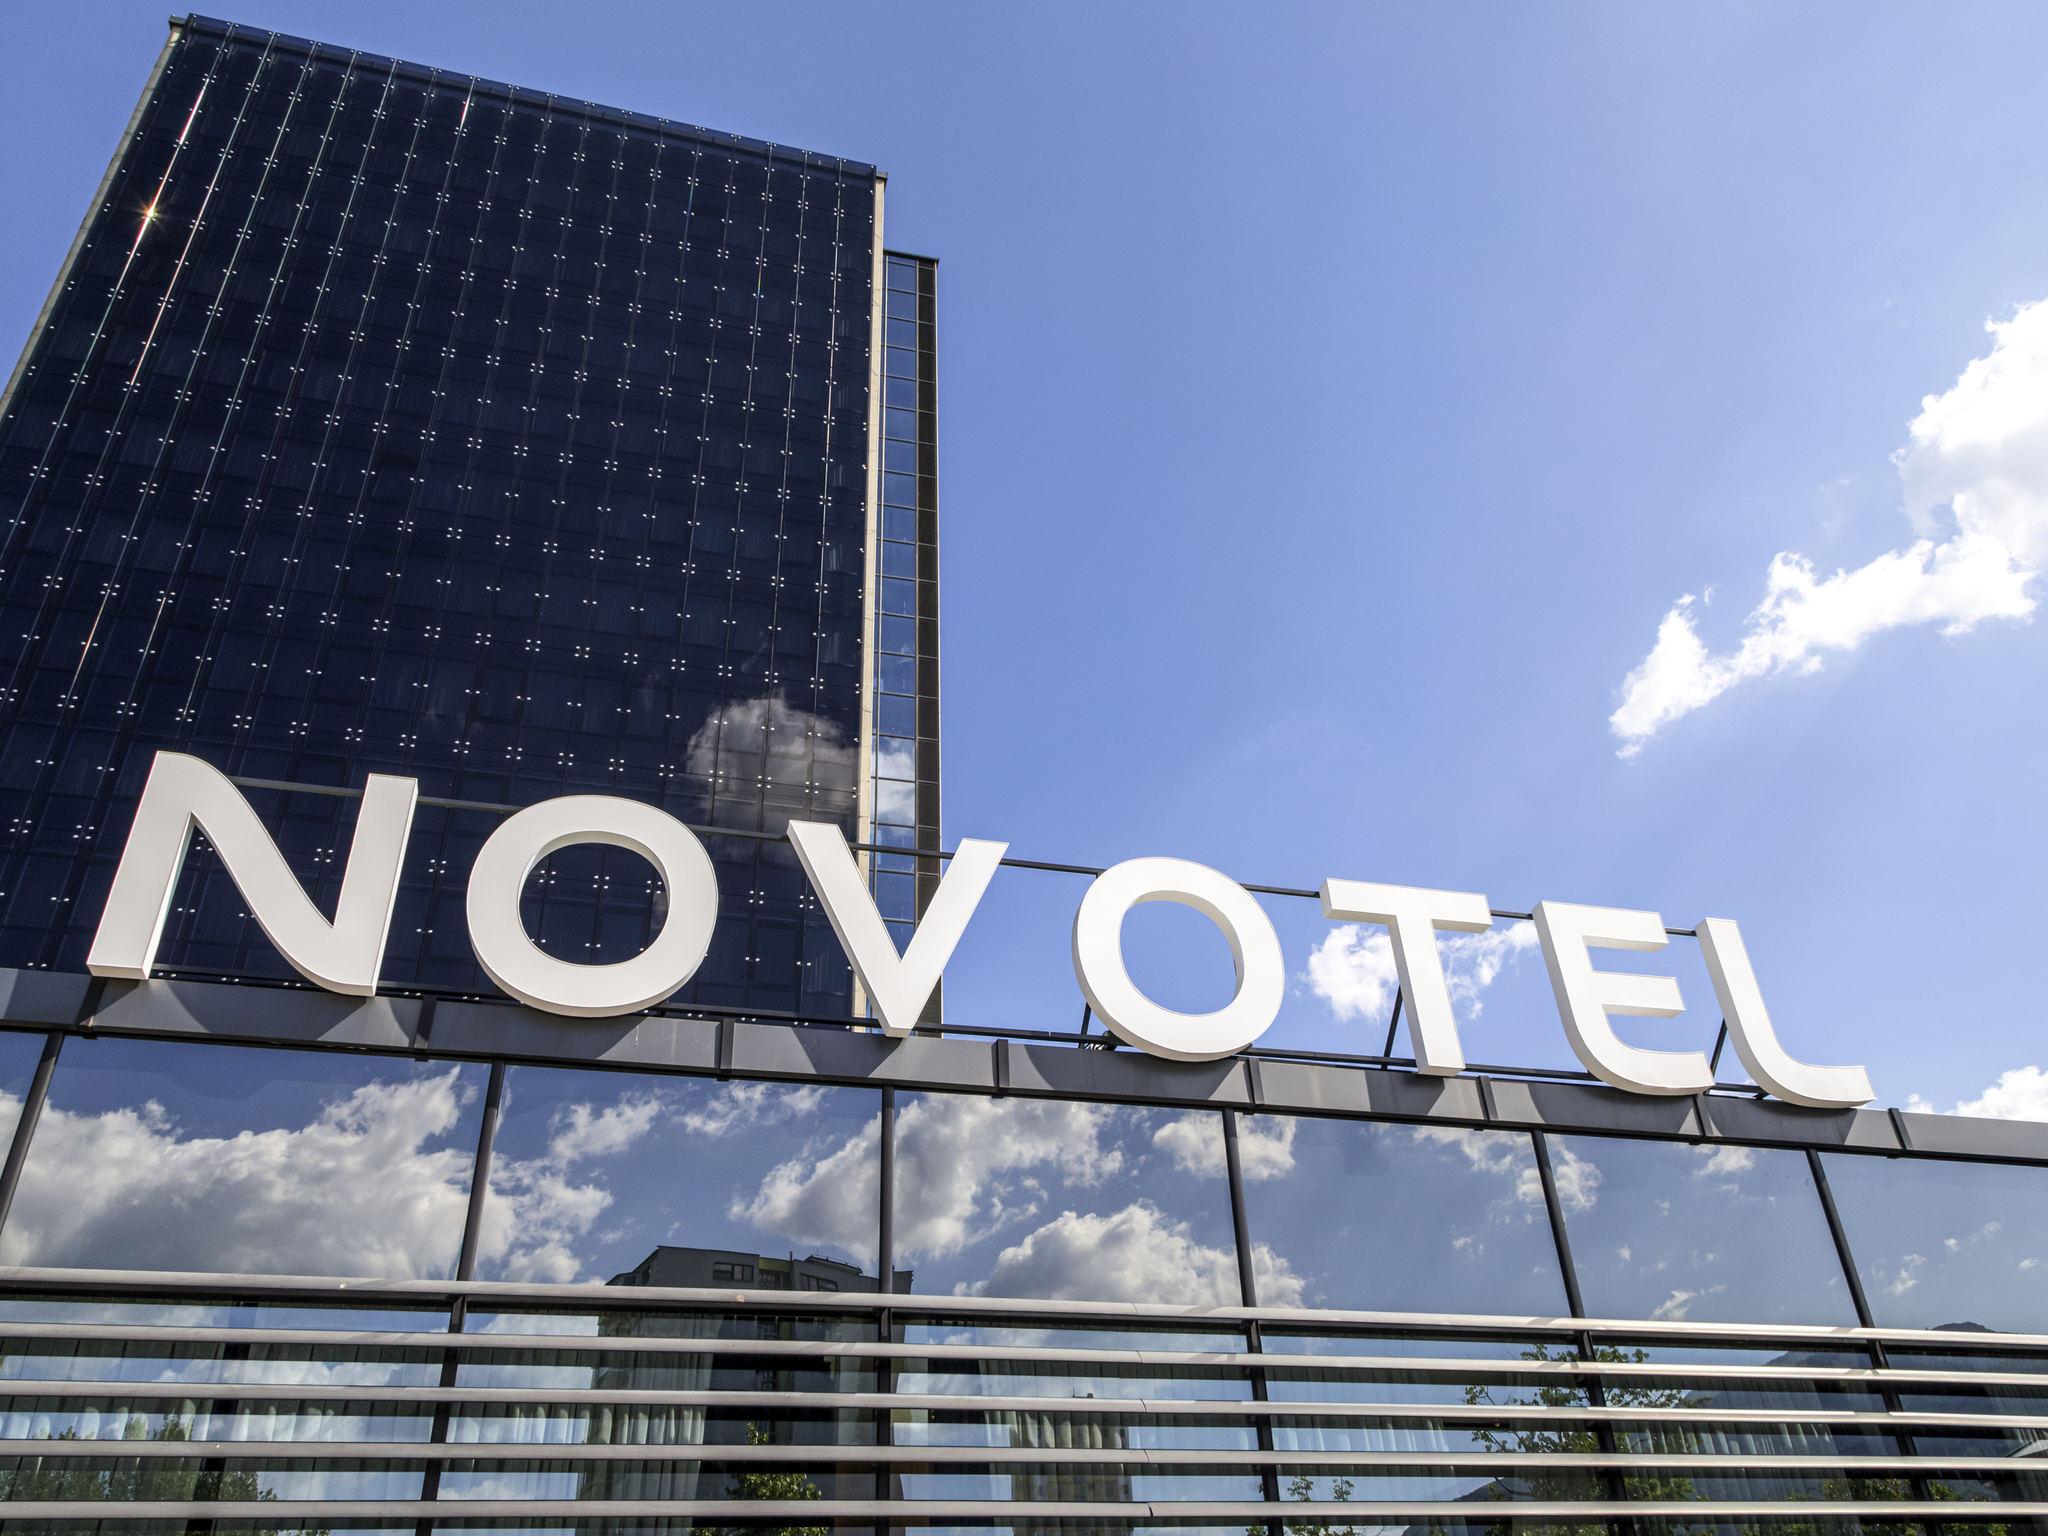 فندق - فندق نوفوتيل Novotel ساراييفو بريستول